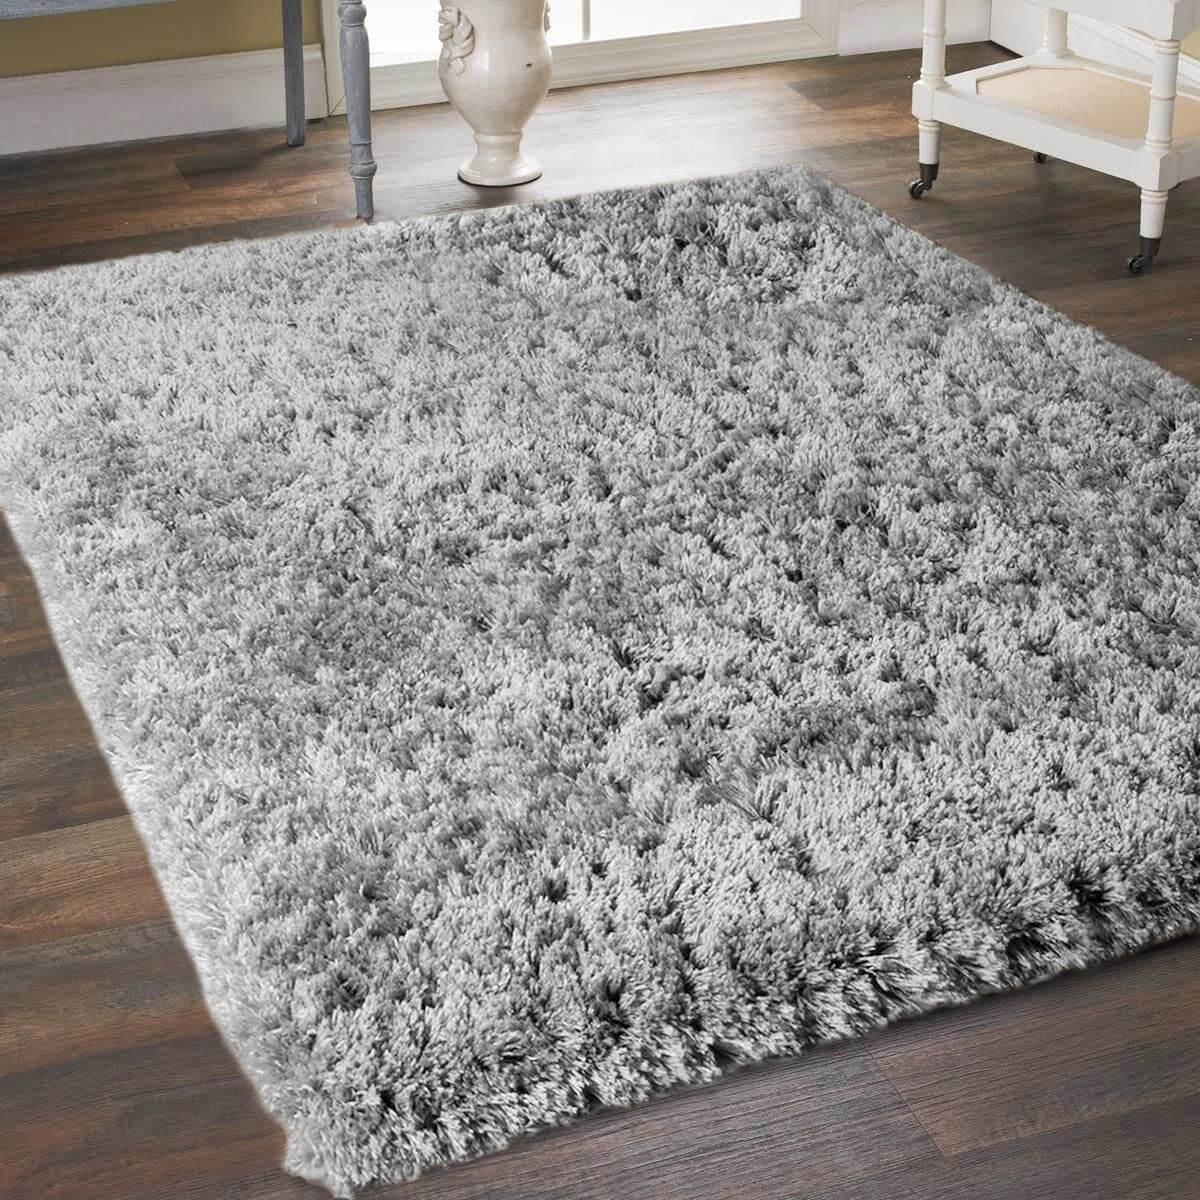 Carpet Characteristic